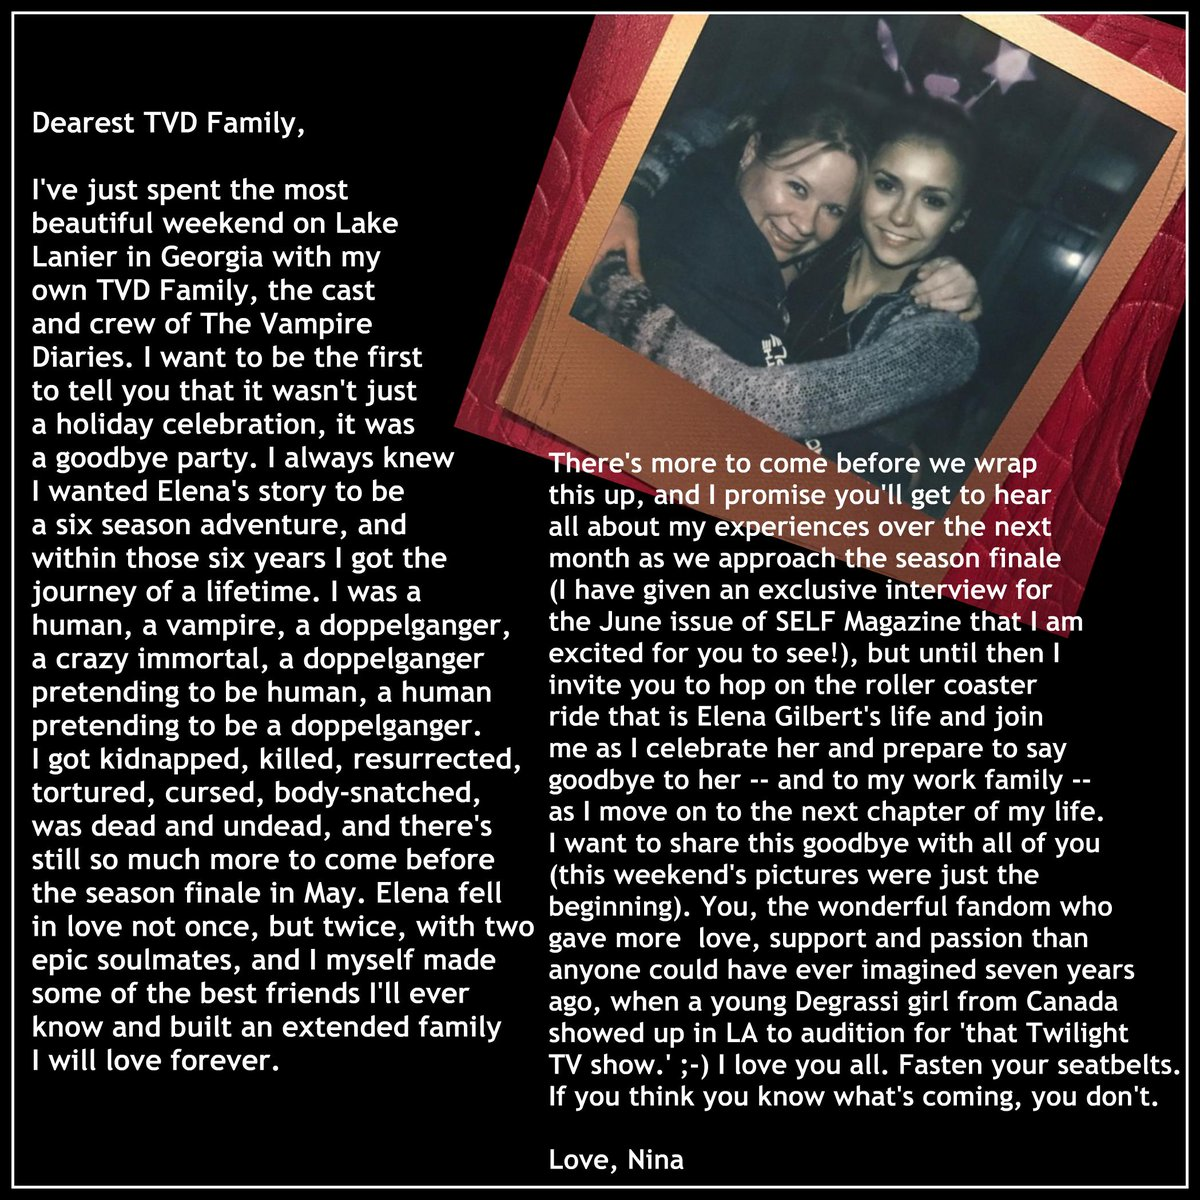 BREAKING NEWS! A message from @ninadobrev #NinaWeWillMissYou https://t.co/hQQEtNkhtD http://t.co/Nat2vXPdZr